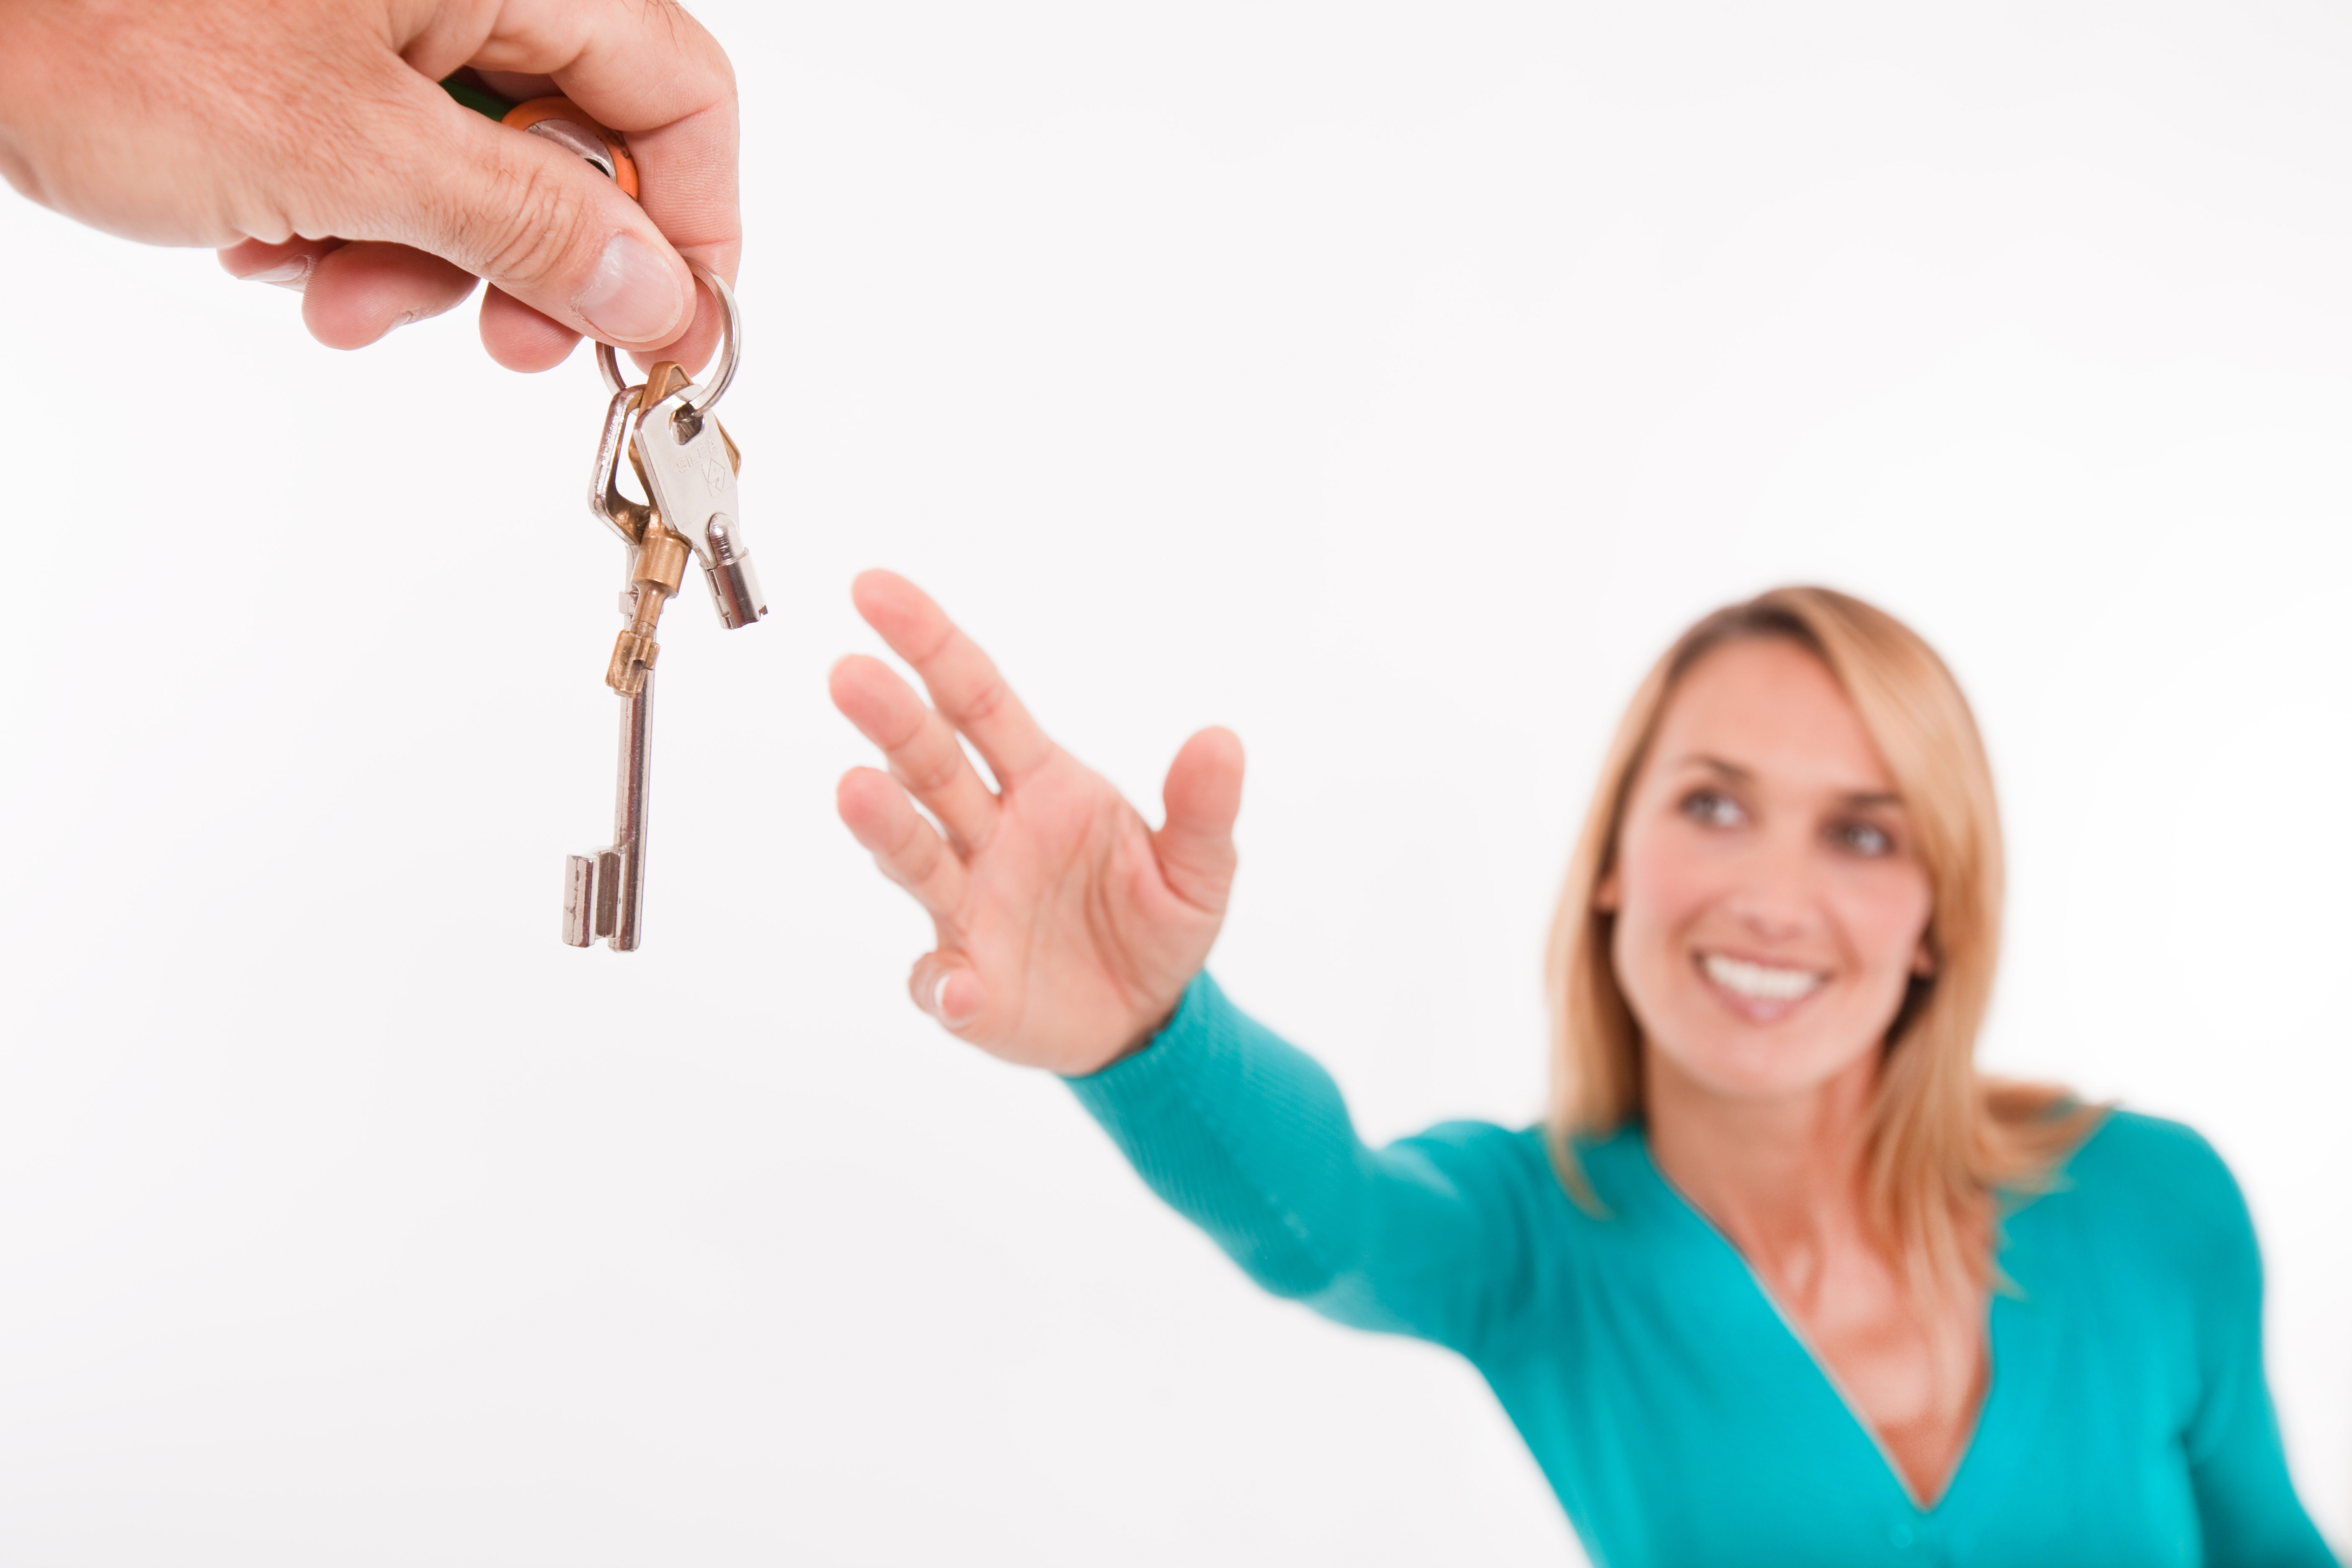 derechos alquiler vivienda